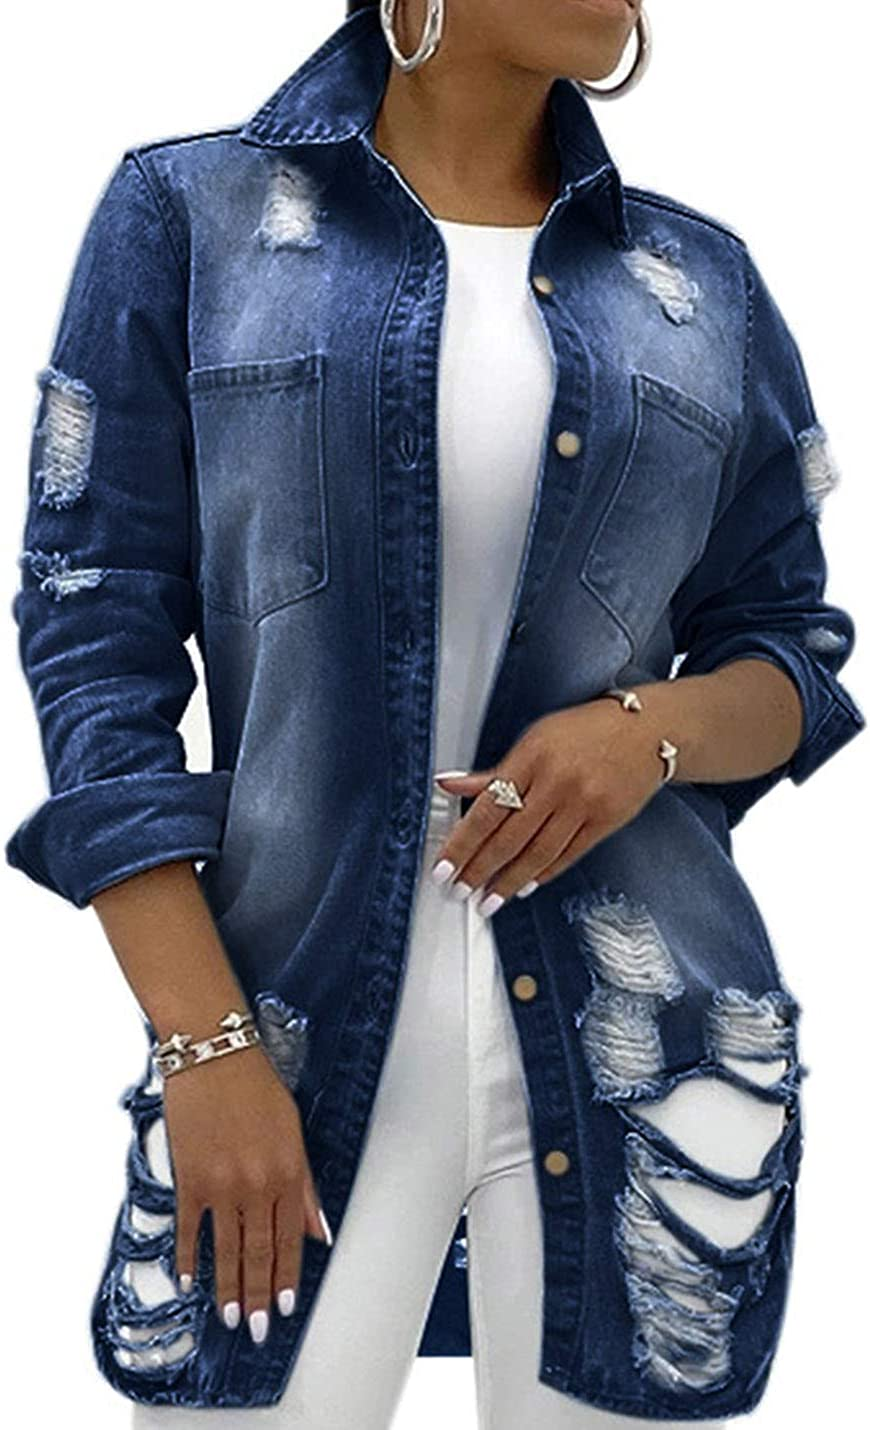 PAODIKUAI Women's Jean Jacket Ripped Distressed Casual Long Sleeve Denim Jacket